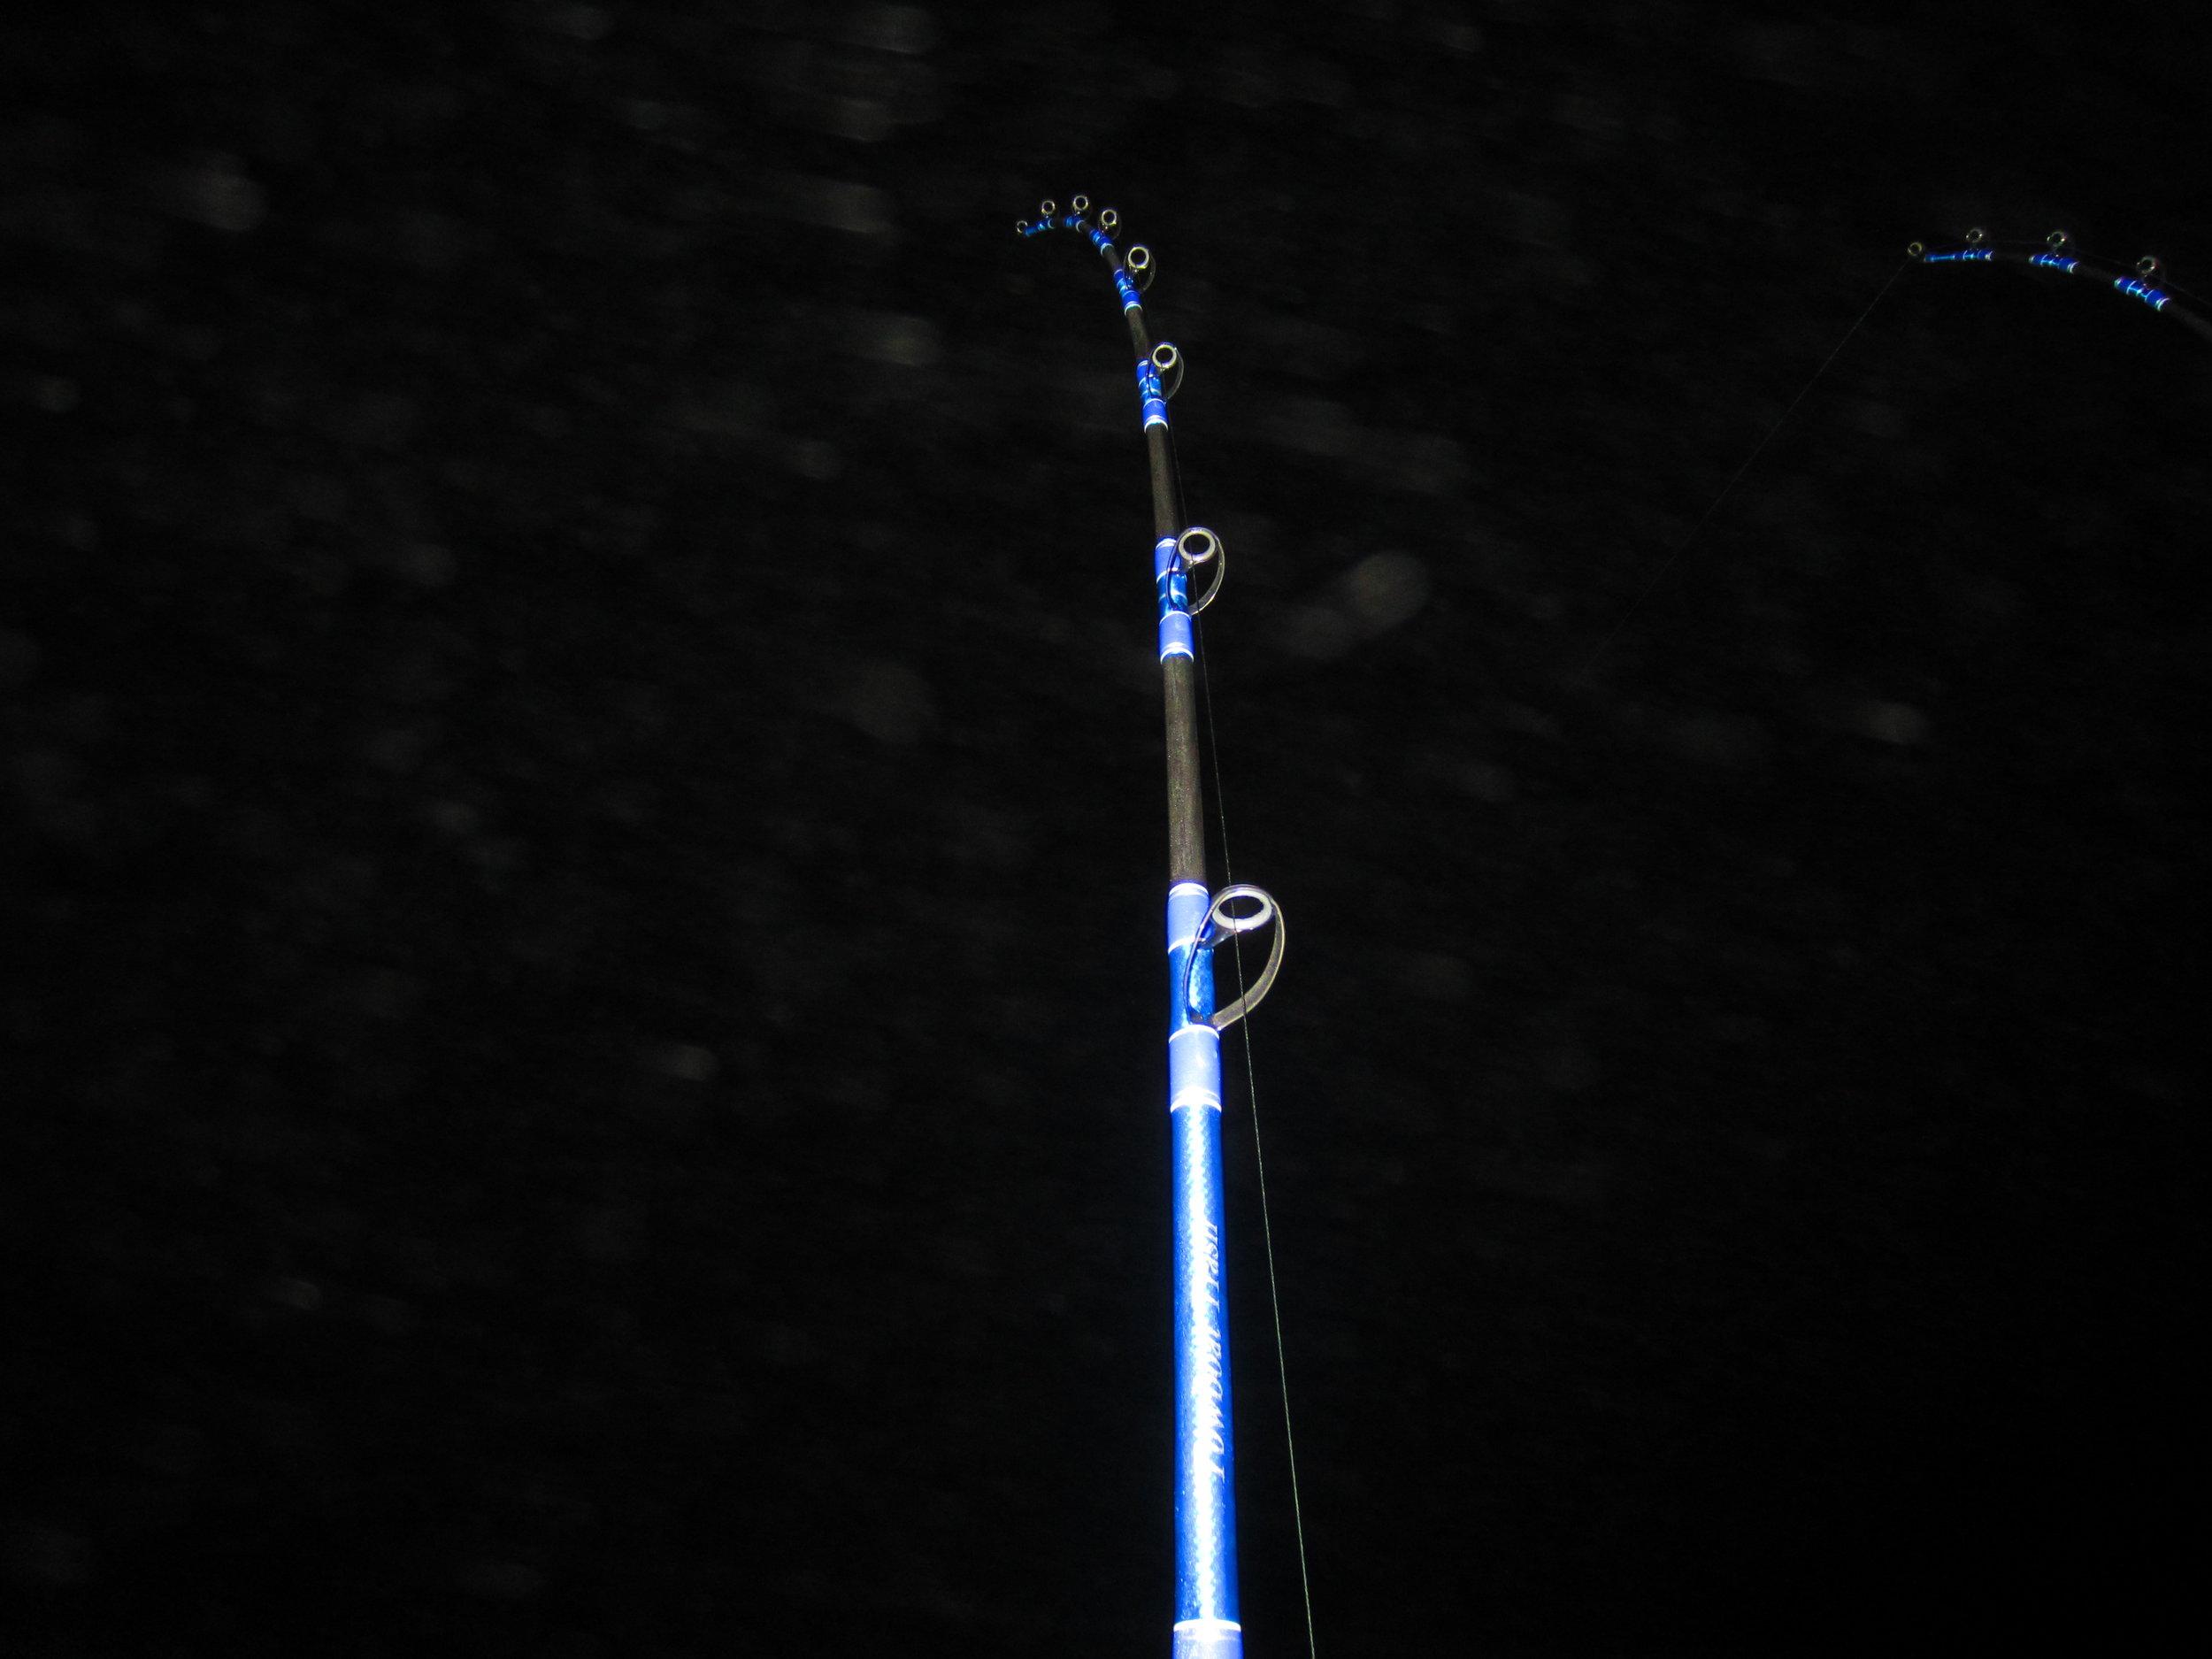 Calstar XXXH hooked up to a shark